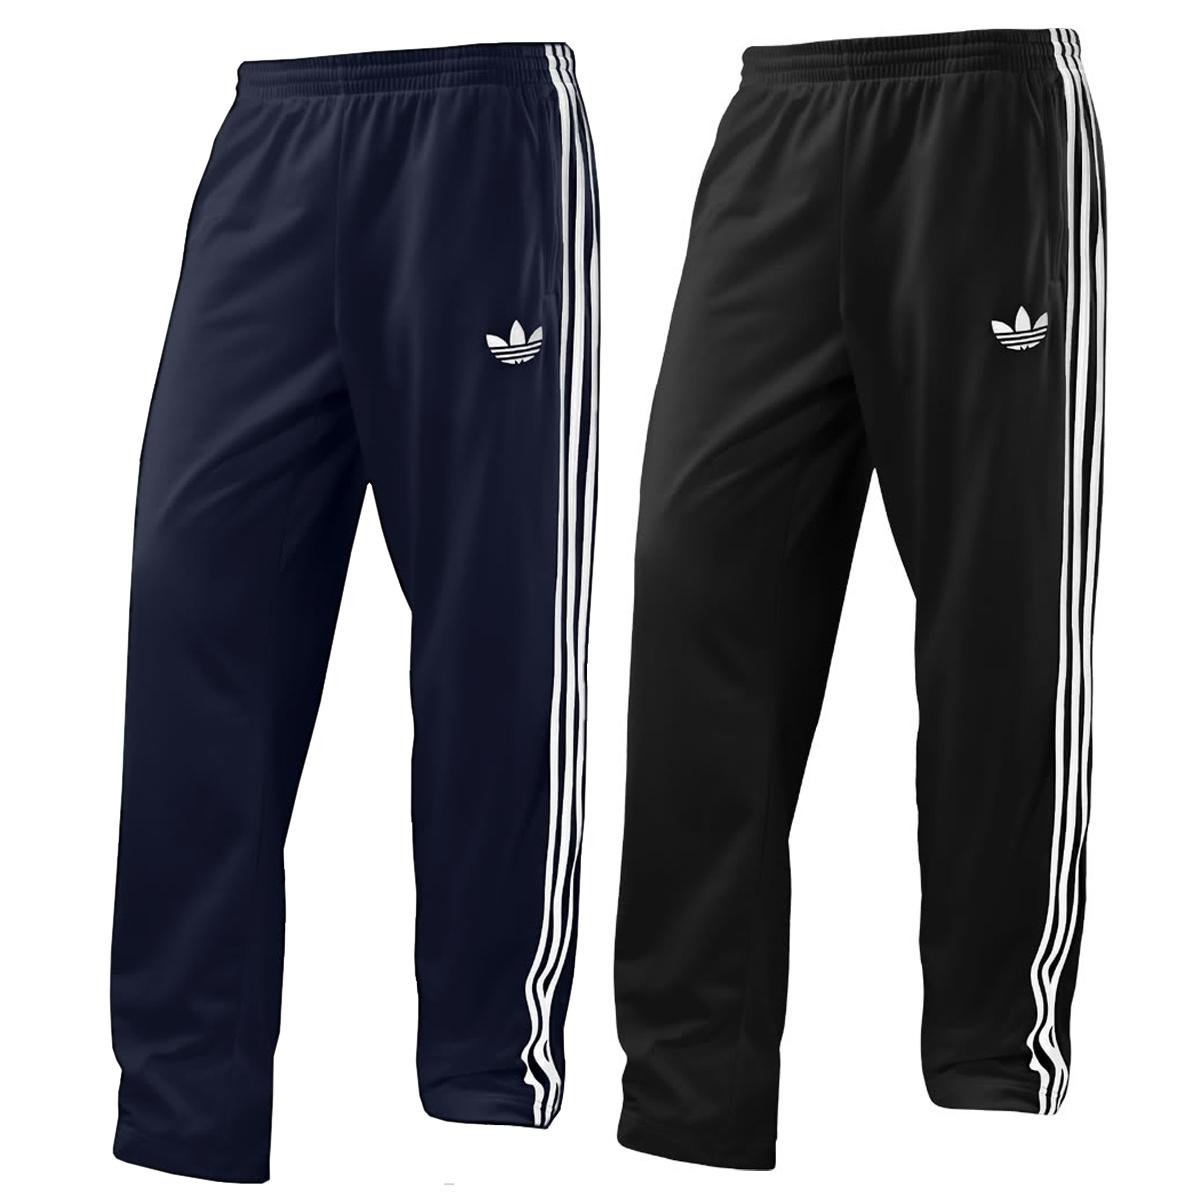 Nike Shoes Adidas Pants